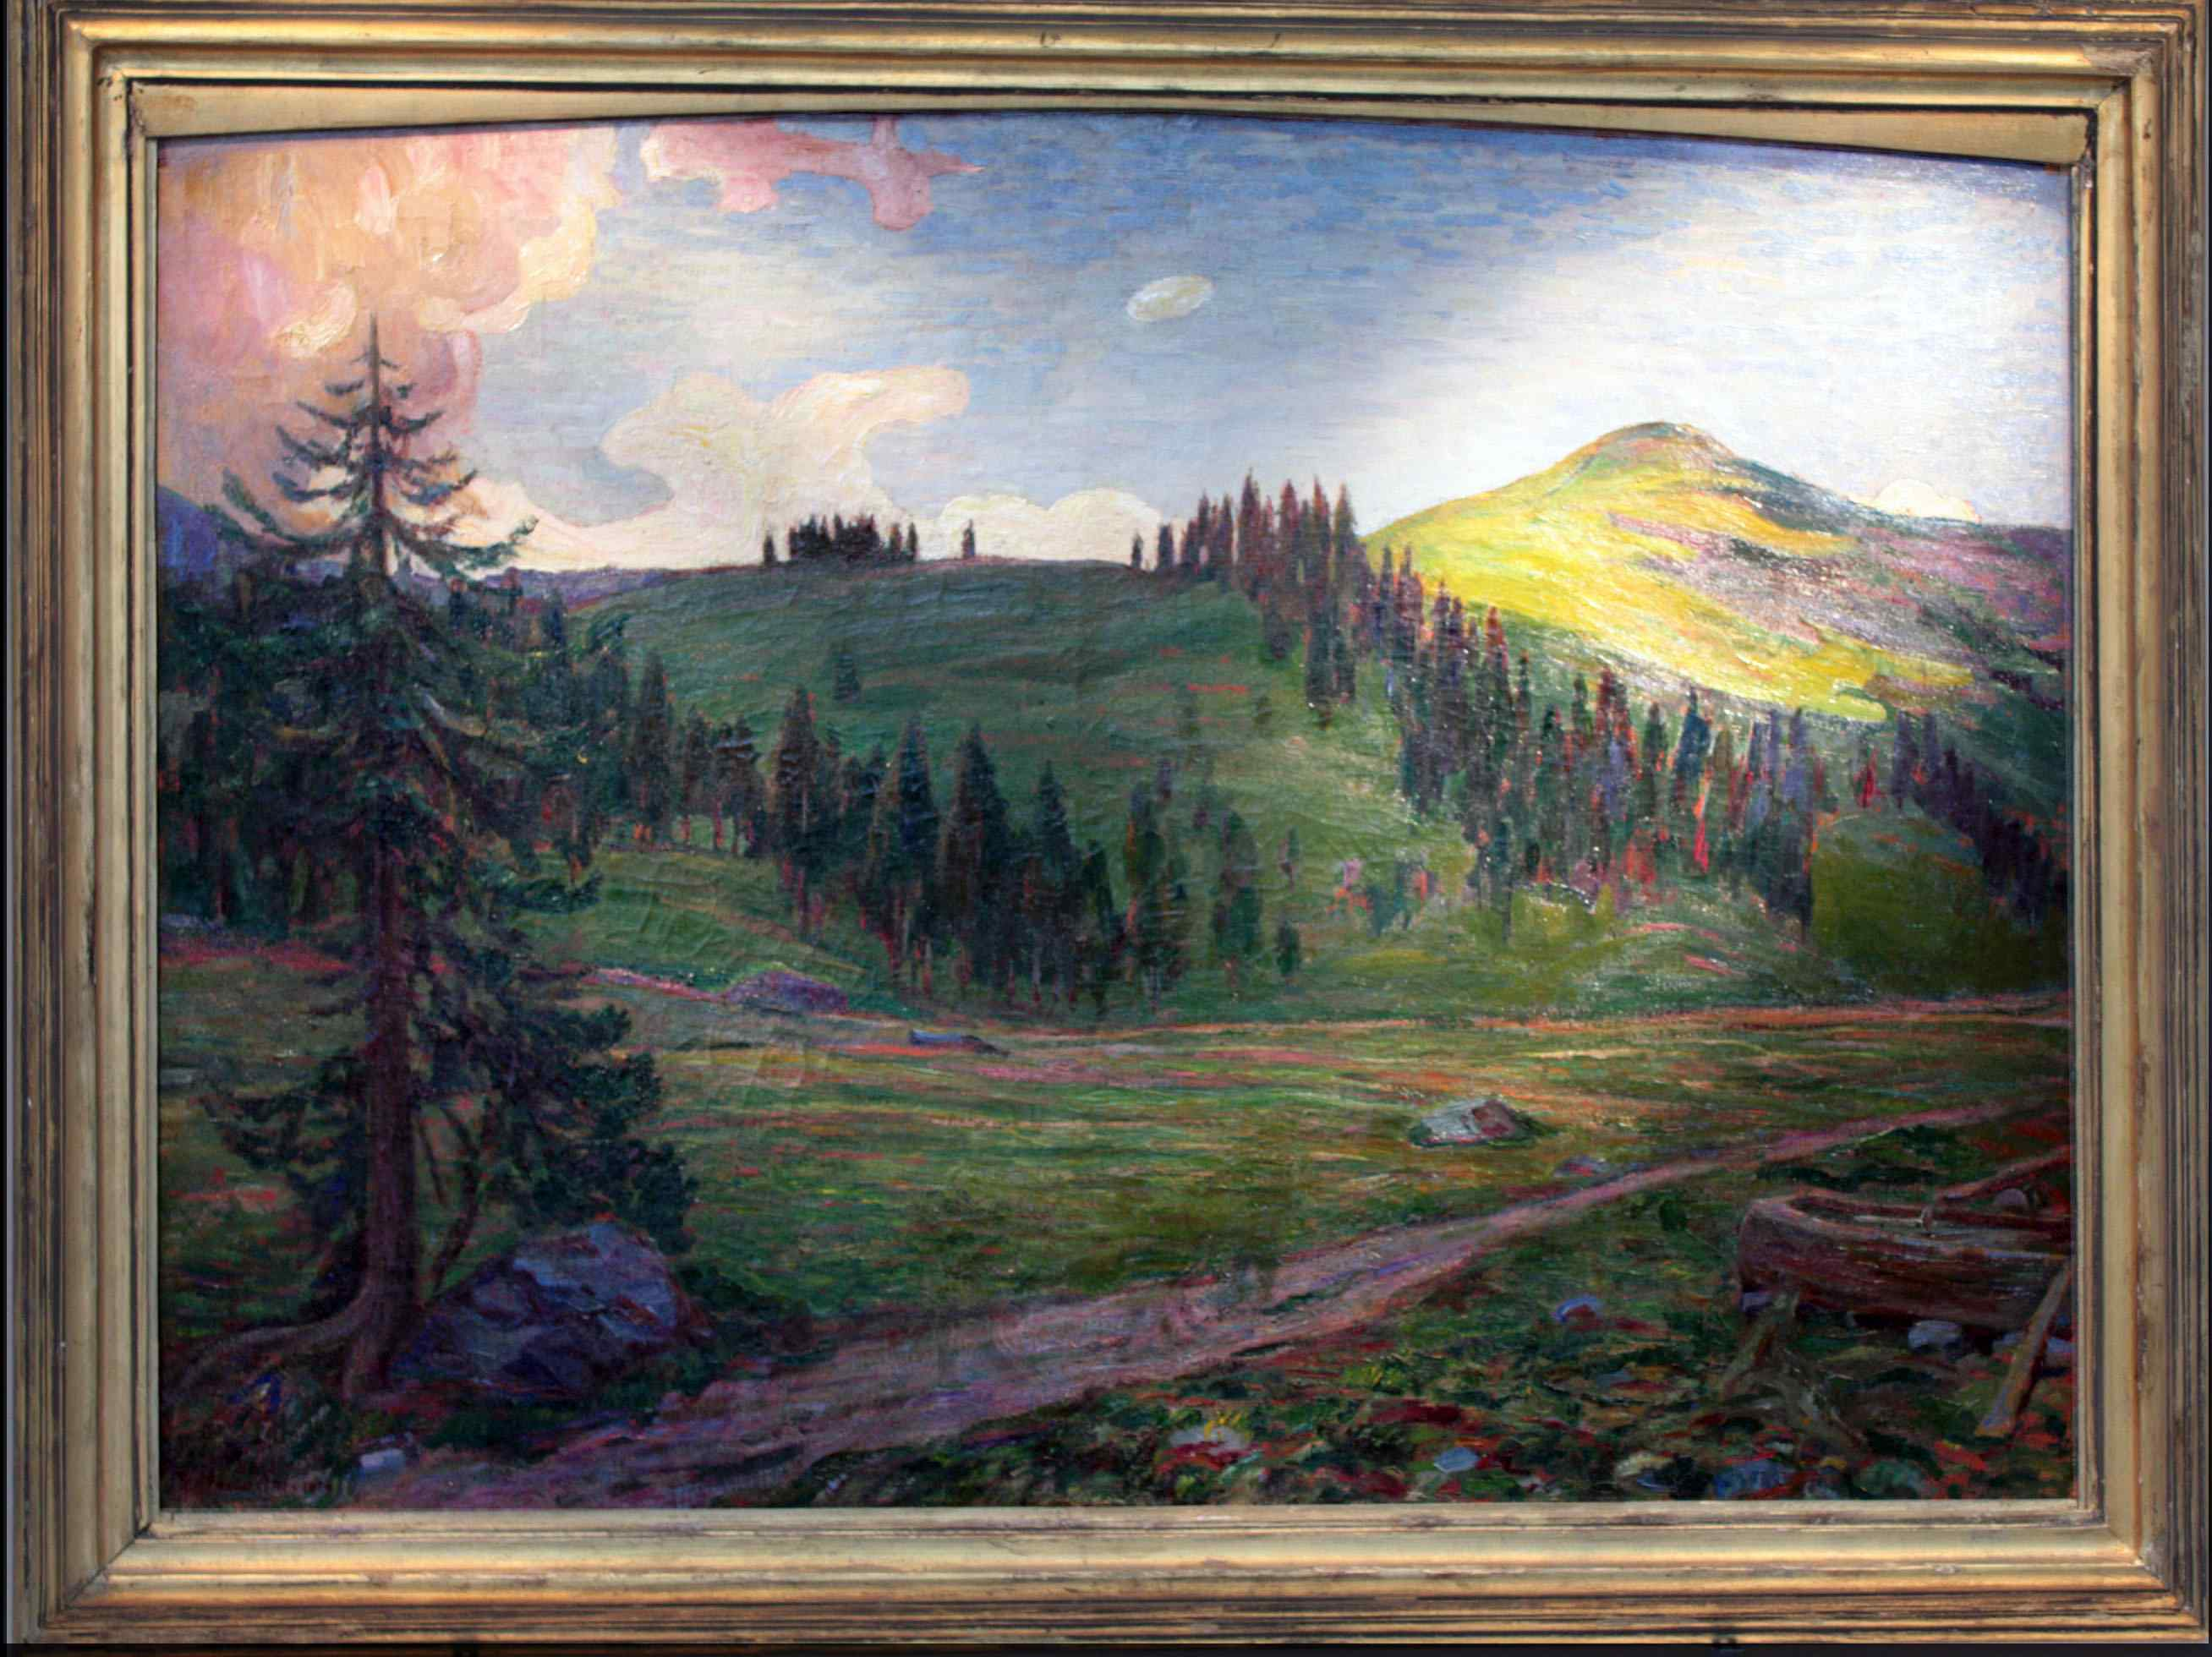 Giuseppe Mascarini (Bologna 1877 - Milano 1954) -  Sentiero